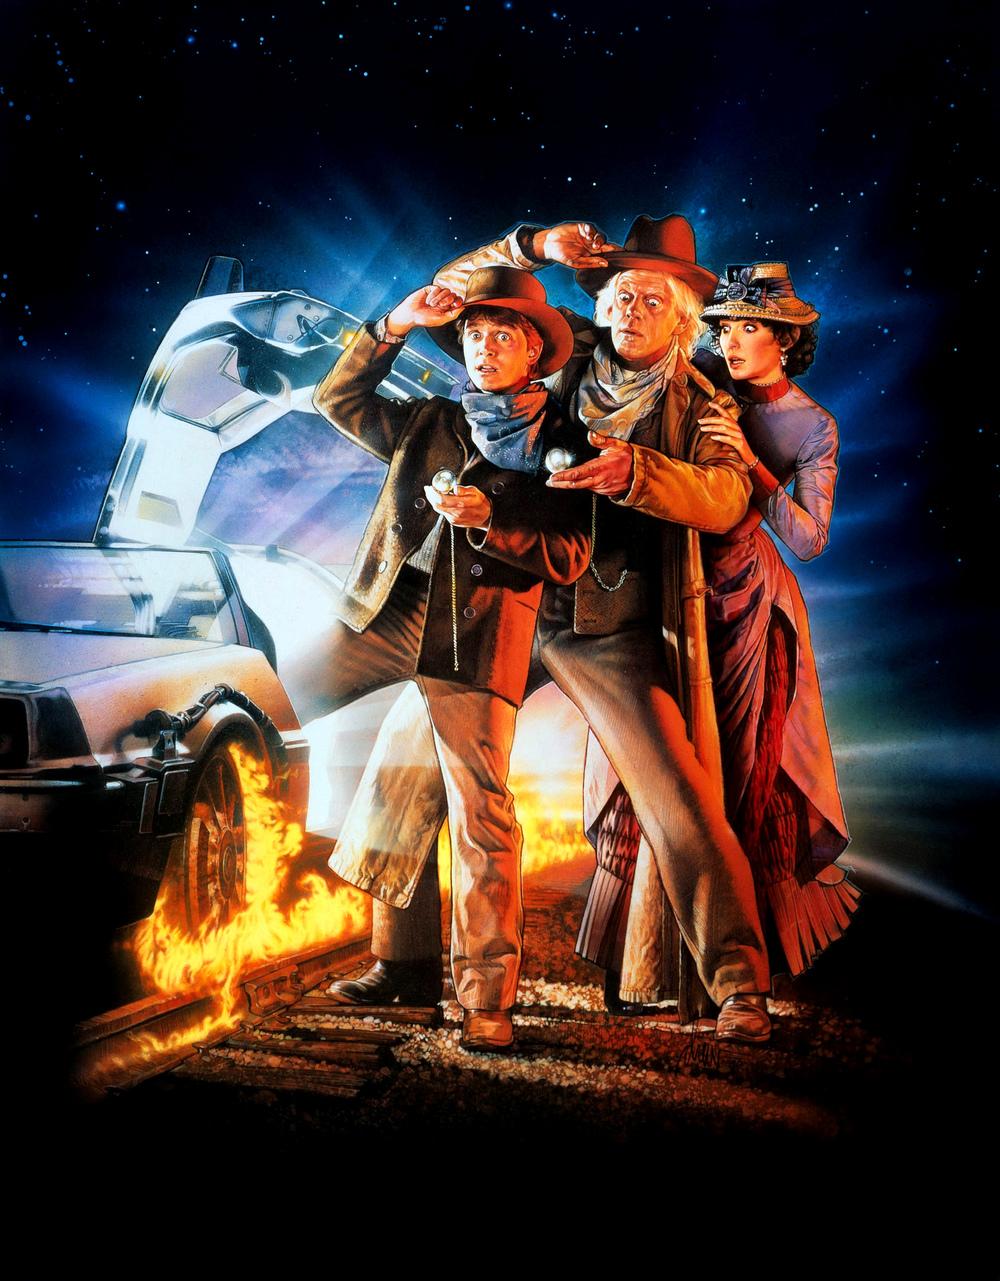 Volver al futuro Parte III (1990) - Robert Zemeckis